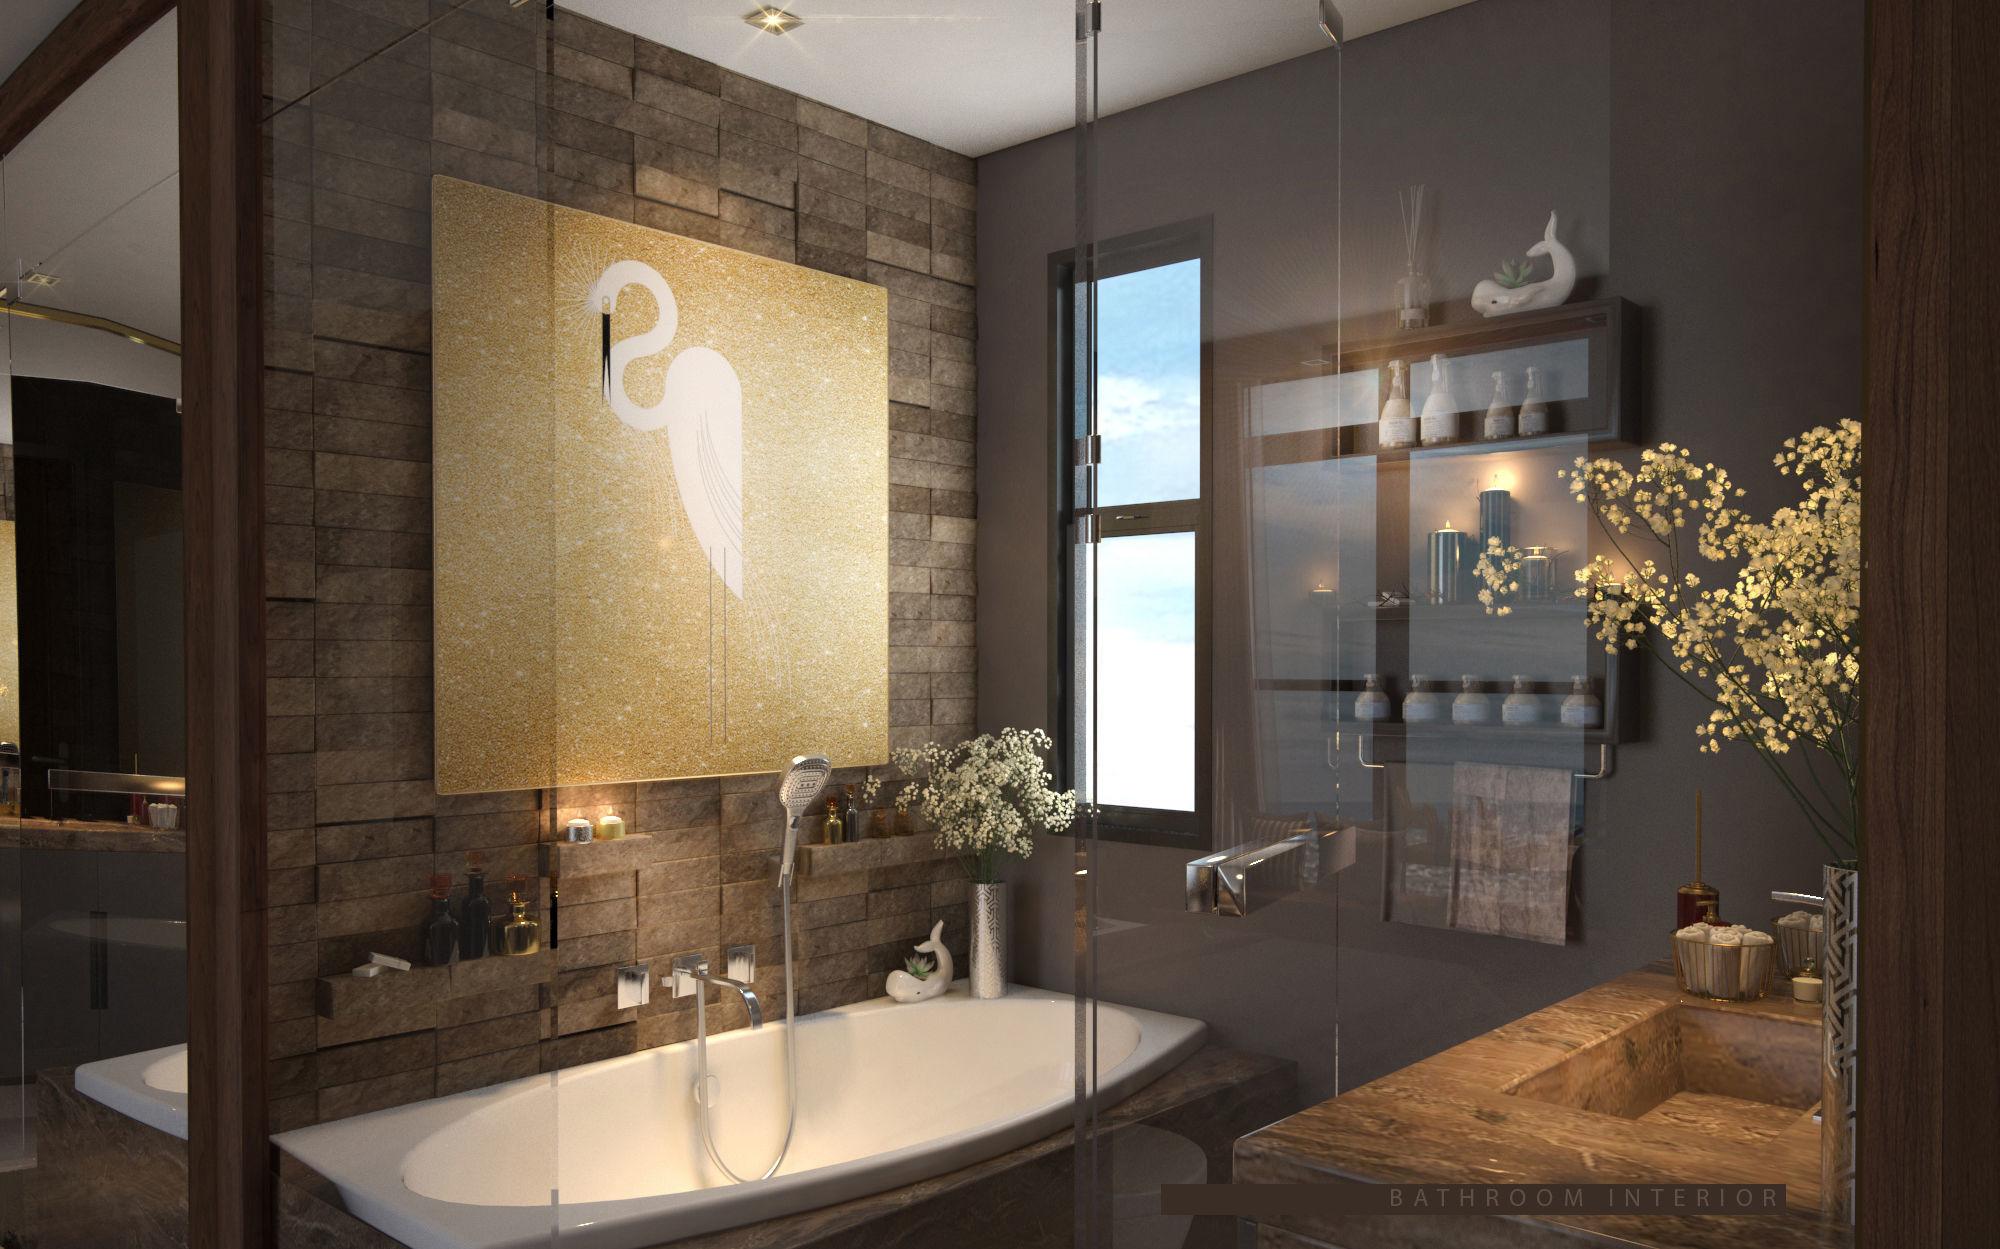 Bathroom Wc Modern Luxurious elegant cozy Granite Interior scene